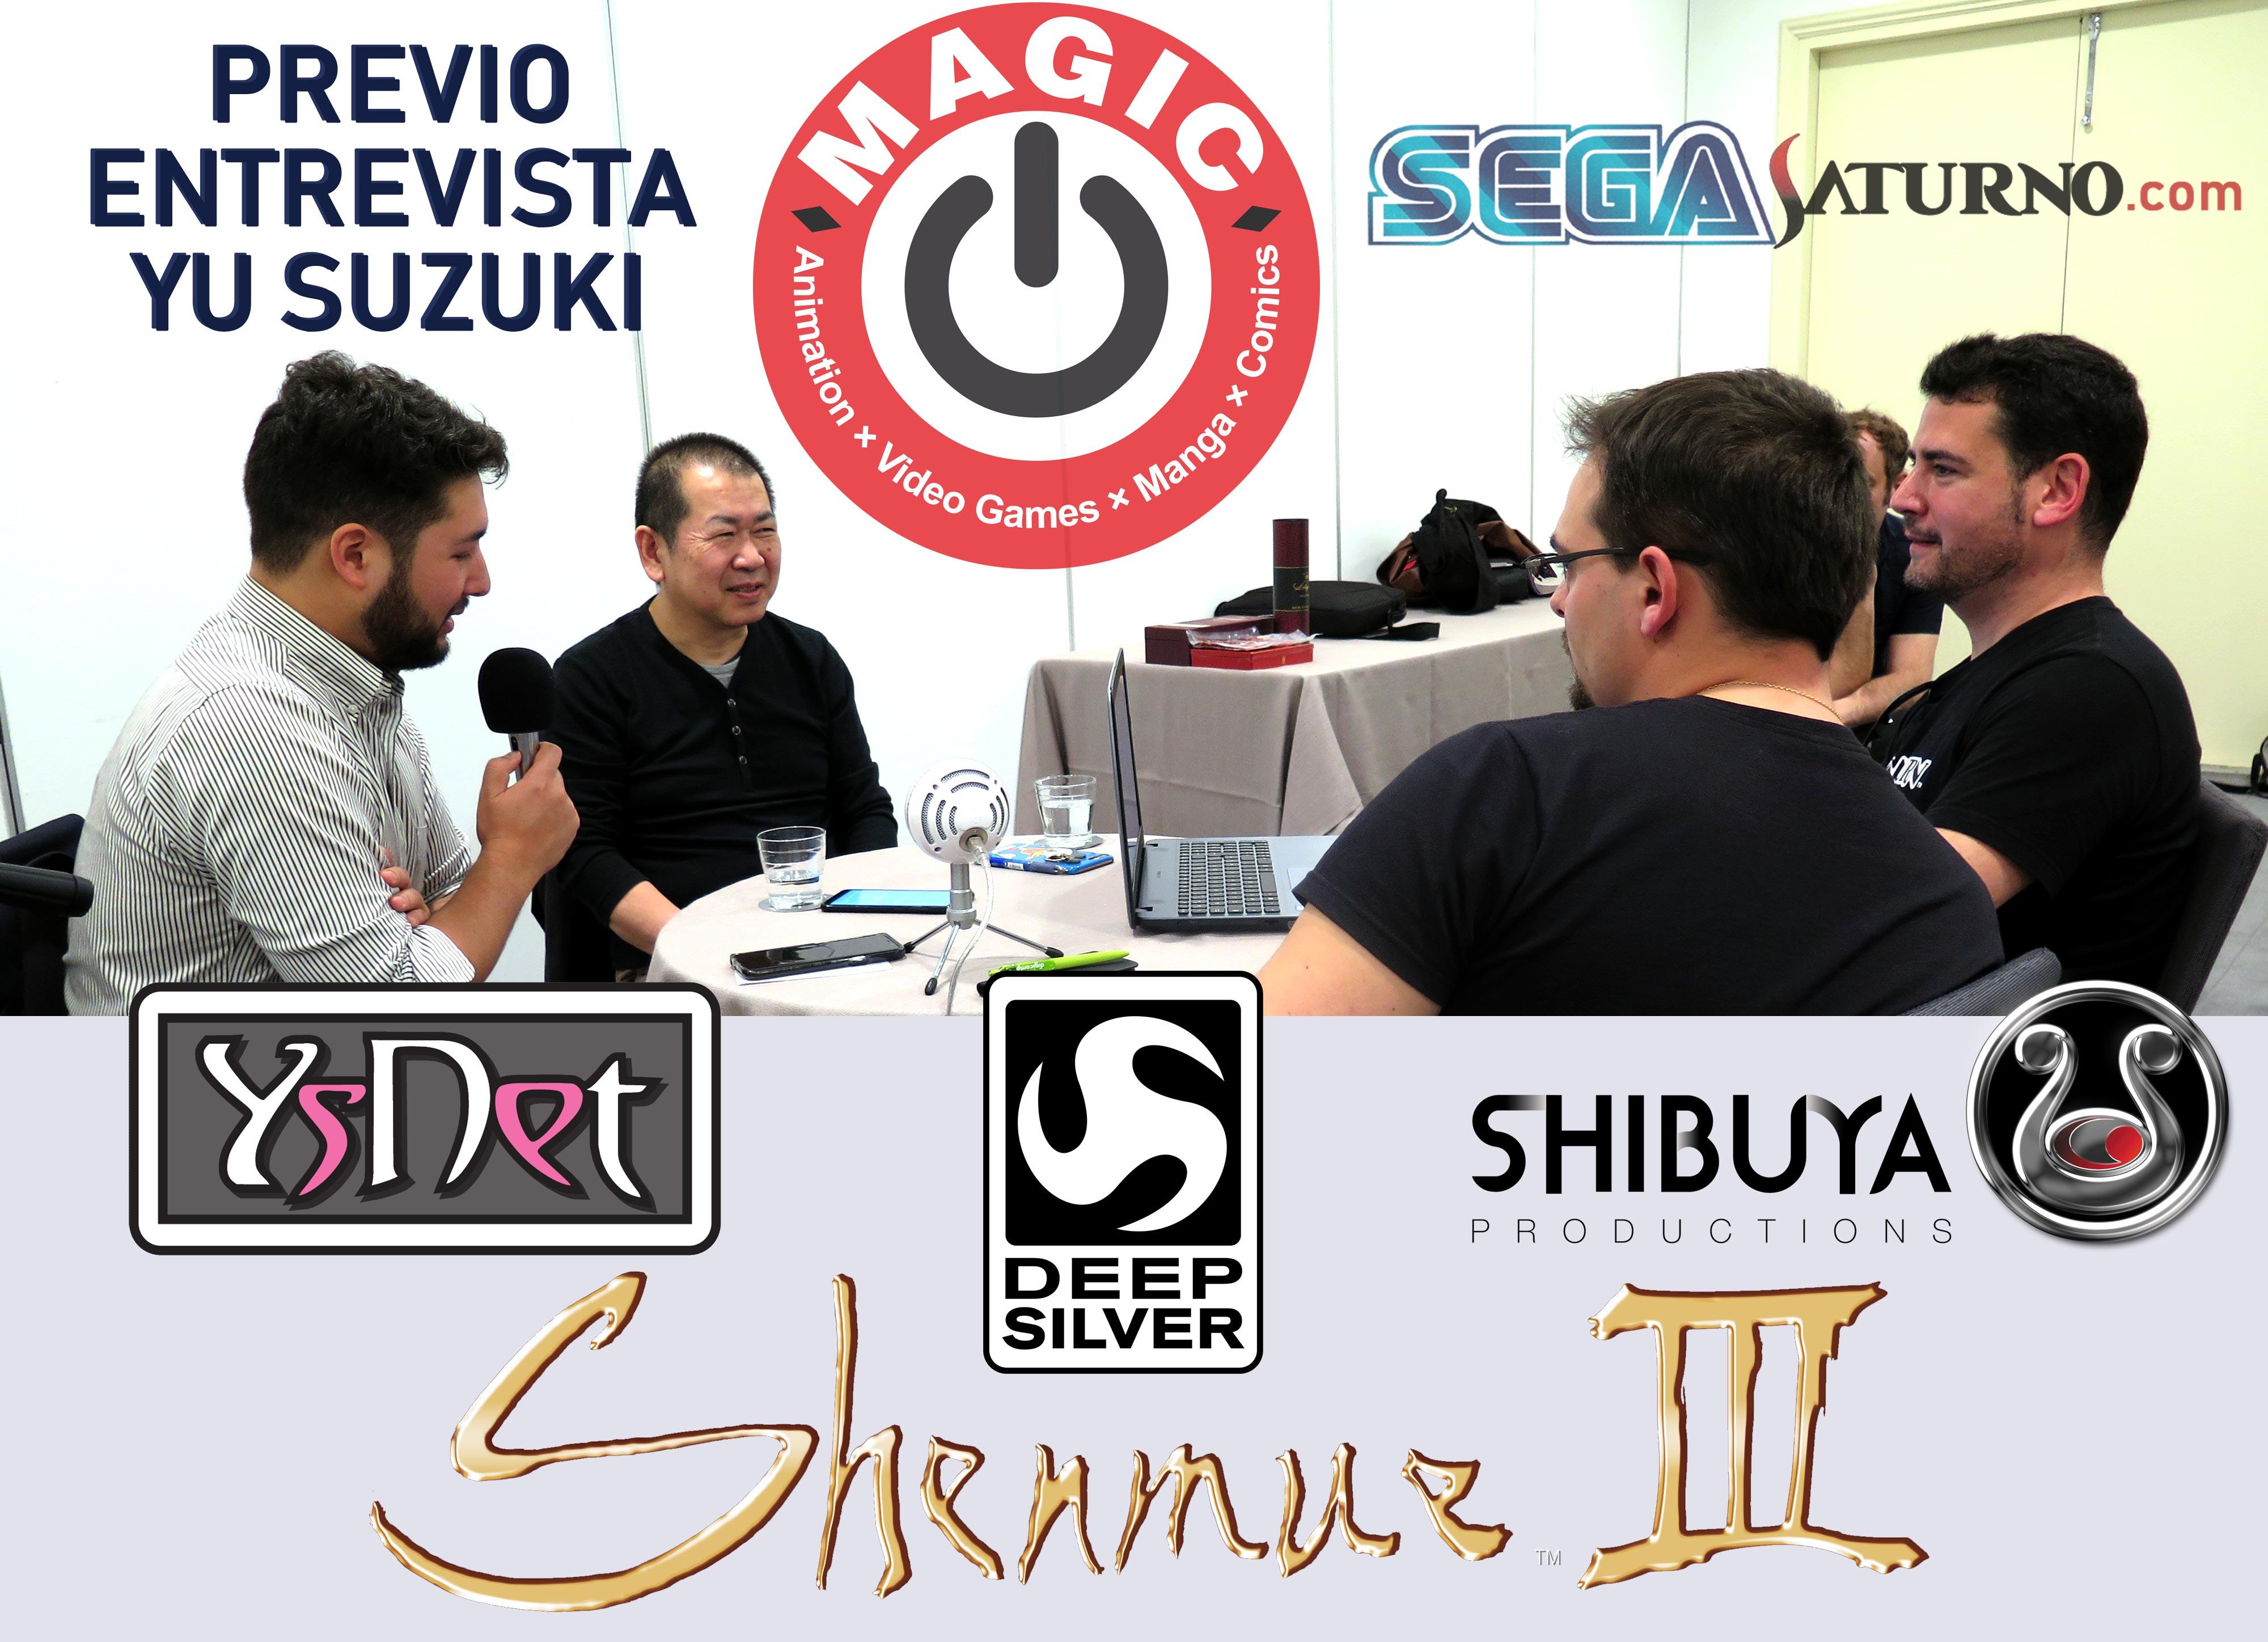 Yu Suzuki MAGIC MONACO 2019 Kenji entrevista interview Shenmue III 3 Raul Requejo Alfon Alfons Alfonso Martinez Gonzalez Agente Requejo Ryo Suzuki